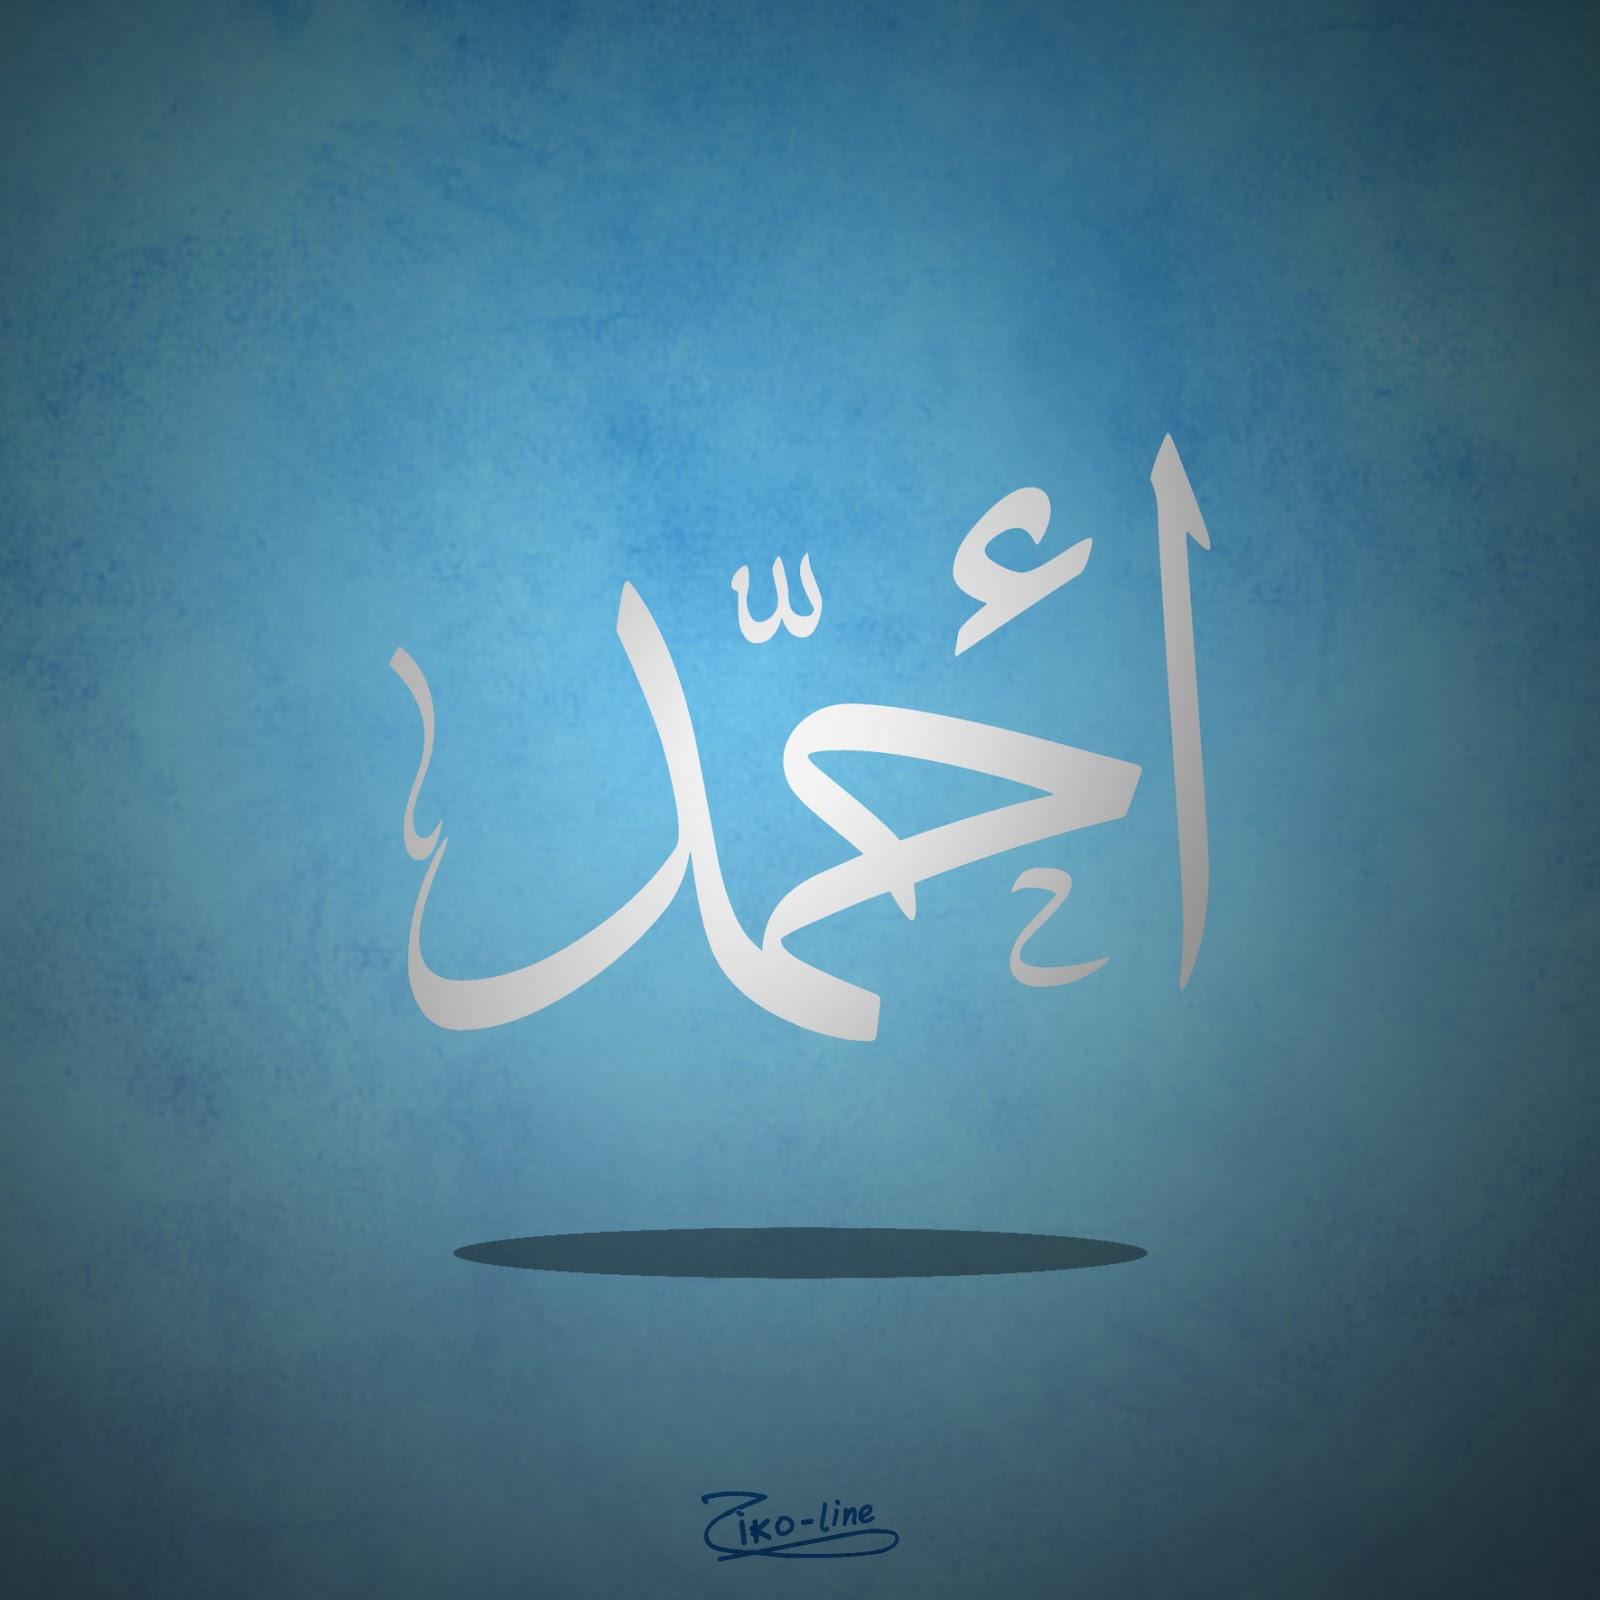 صور خلفيات معلومات اسم احمد Ahmed 24